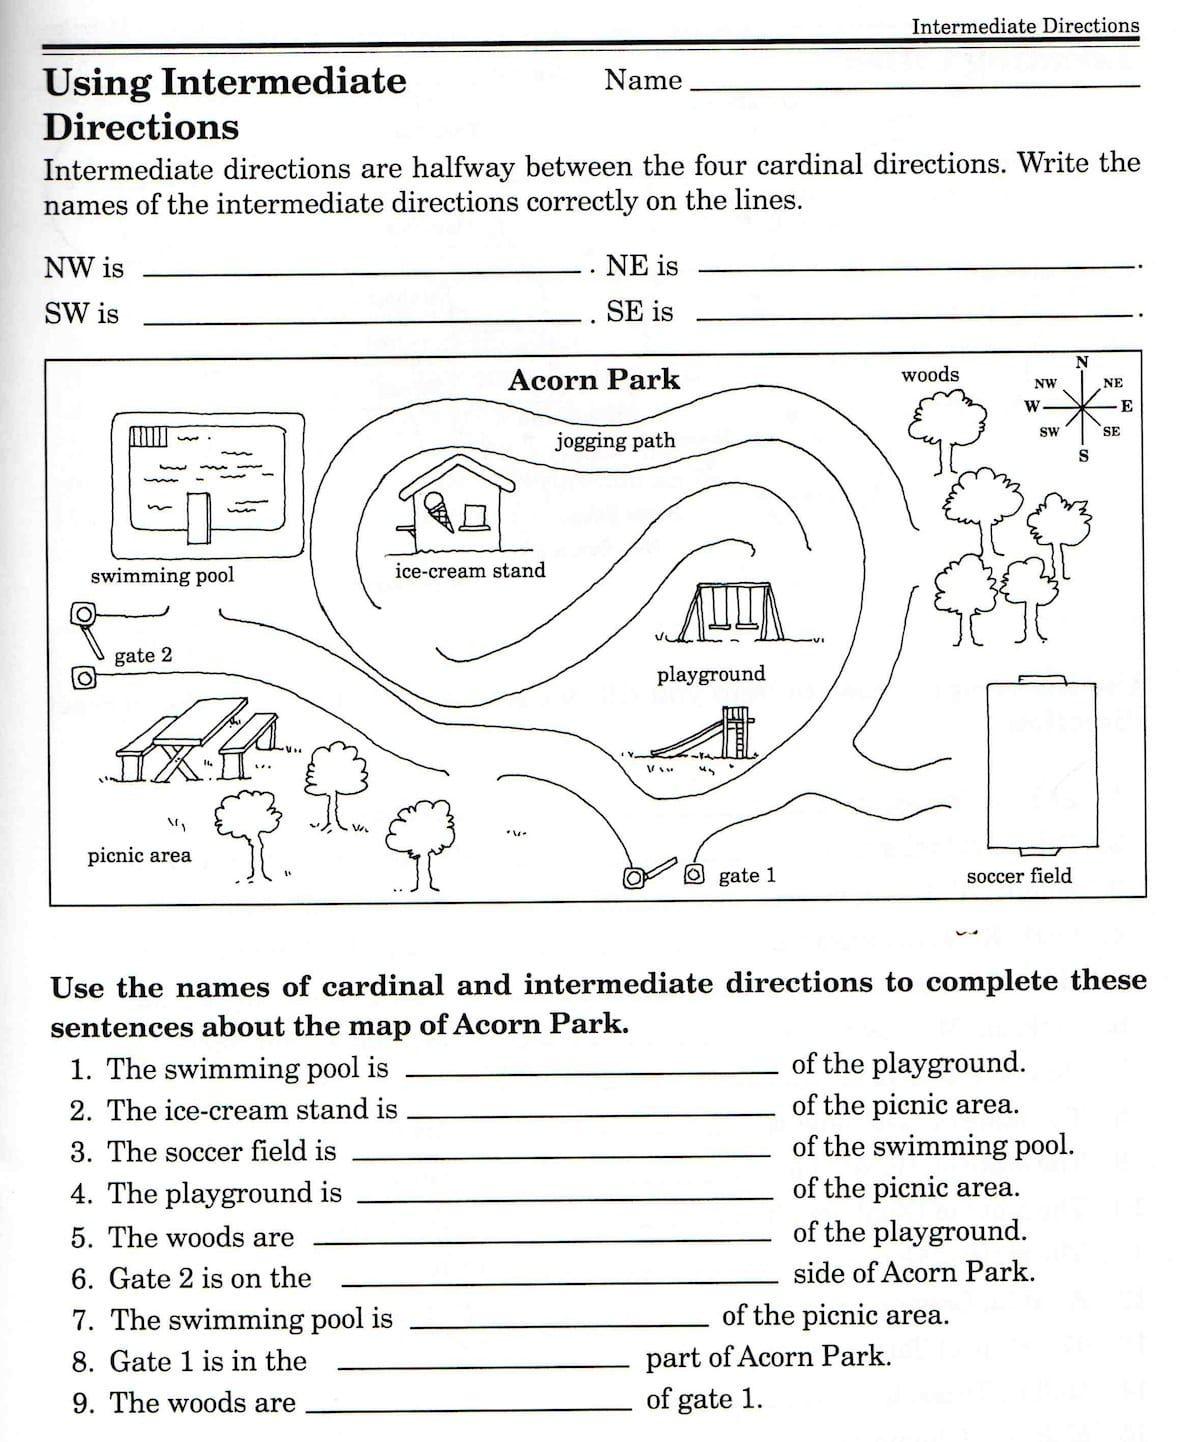 Second Grade Map Skills Worksheets Map Skills Worksheets 3rd Grade Map Skills Worksheets Geography Worksheets Social Studies Worksheets